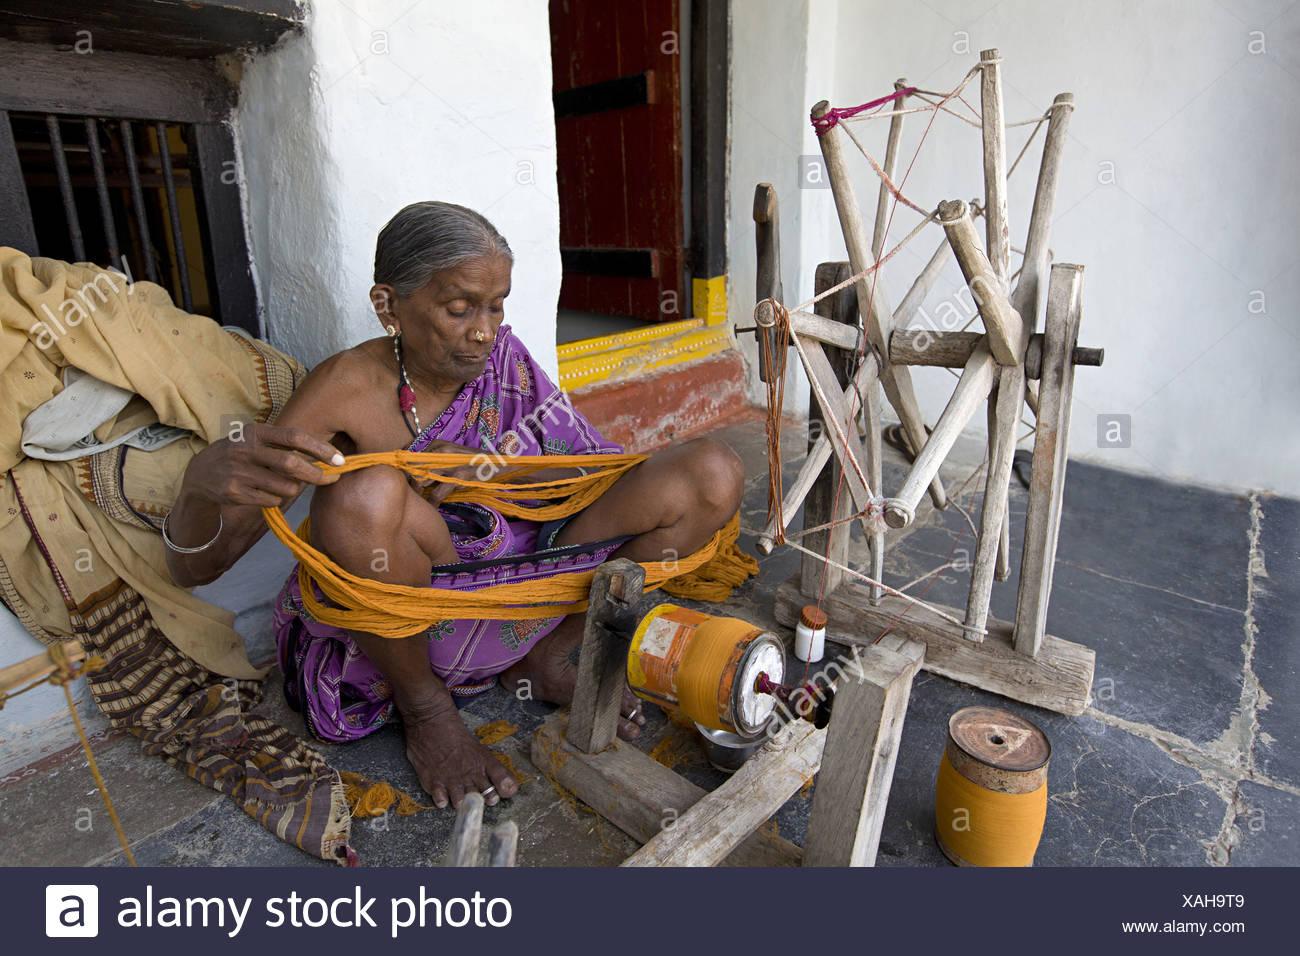 The Charkha Stock Photos & The Charkha Stock Images - Alamy